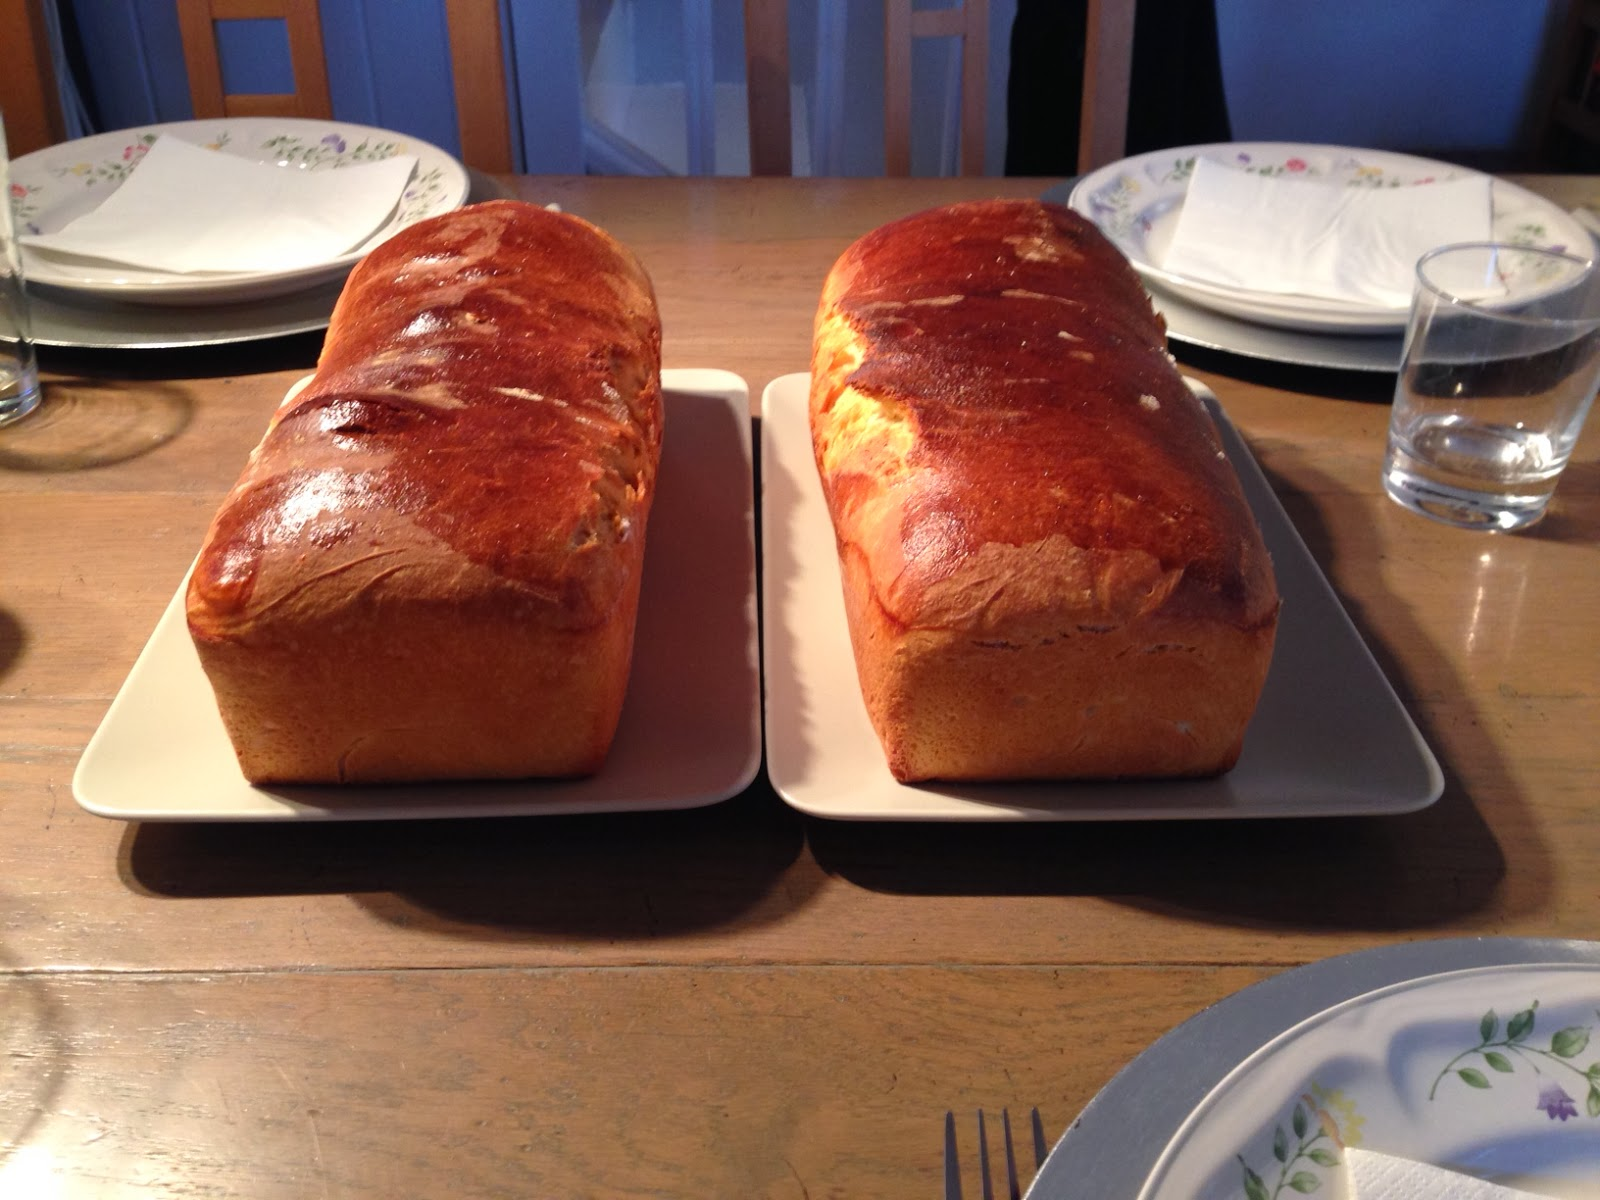 Au coeur du pain saucisson brioch for Saucisson brioche